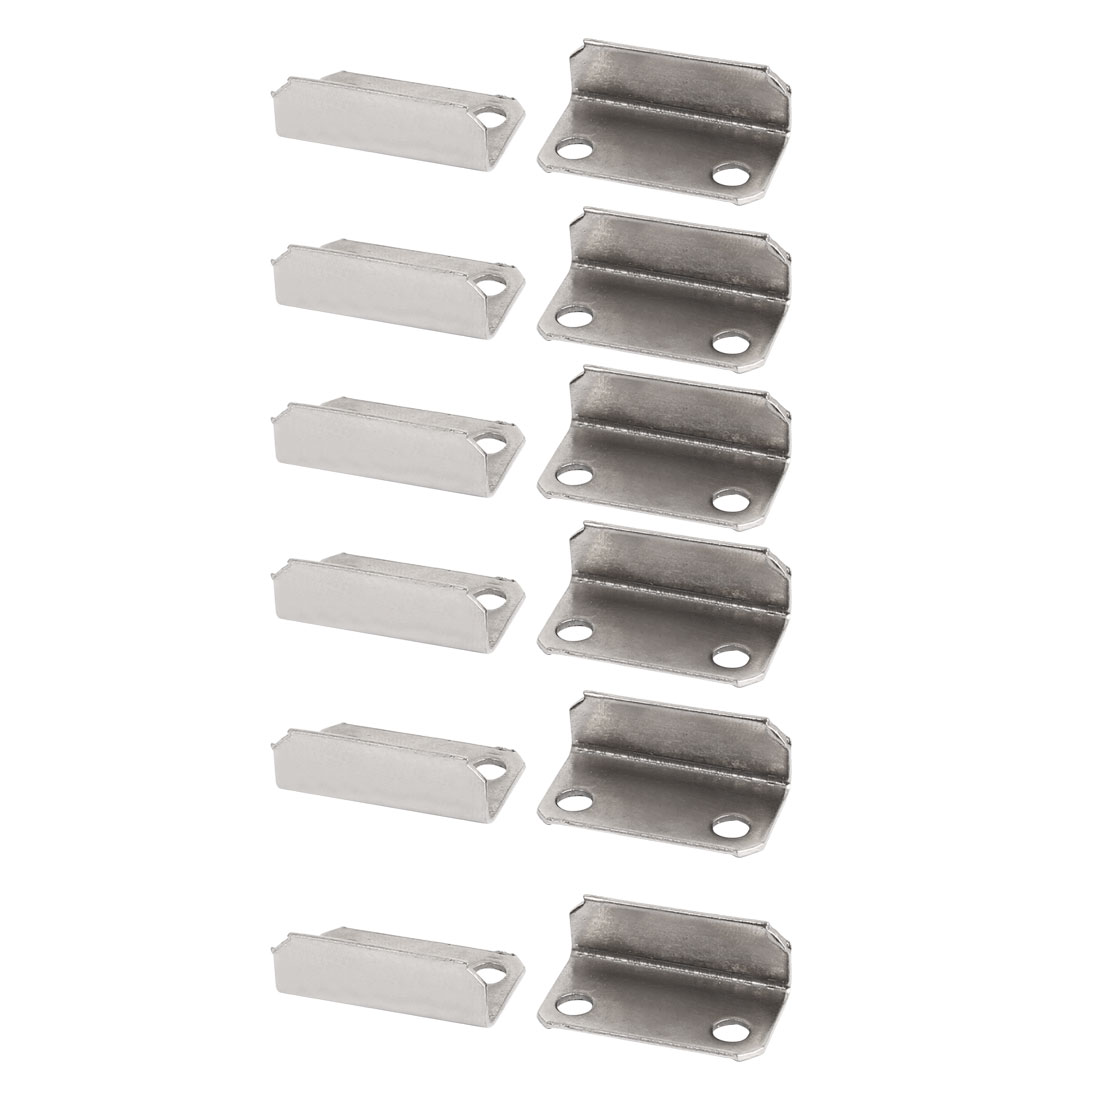 Cabinet Cupboard Drawer Lock Strike Plate Silver Tone 29mm x 16mm x 10mm 12pcs